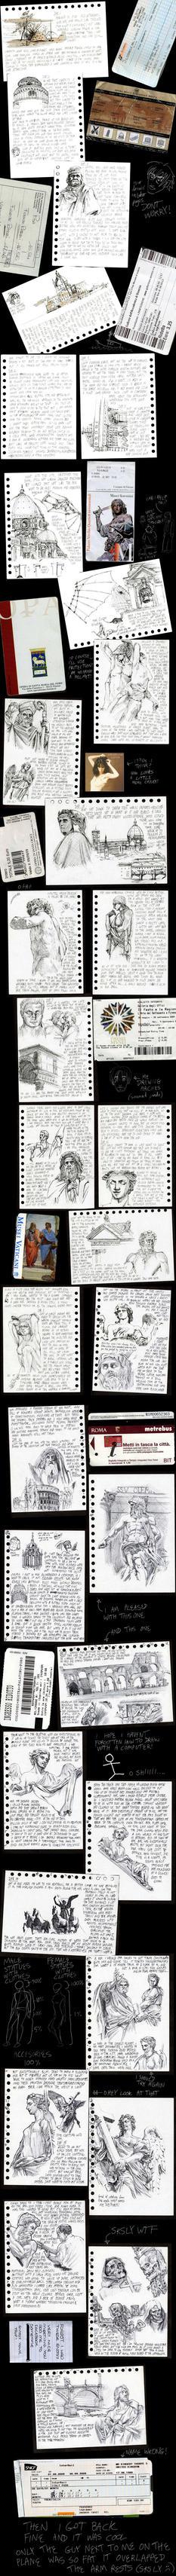 Travel Diary by kingaby